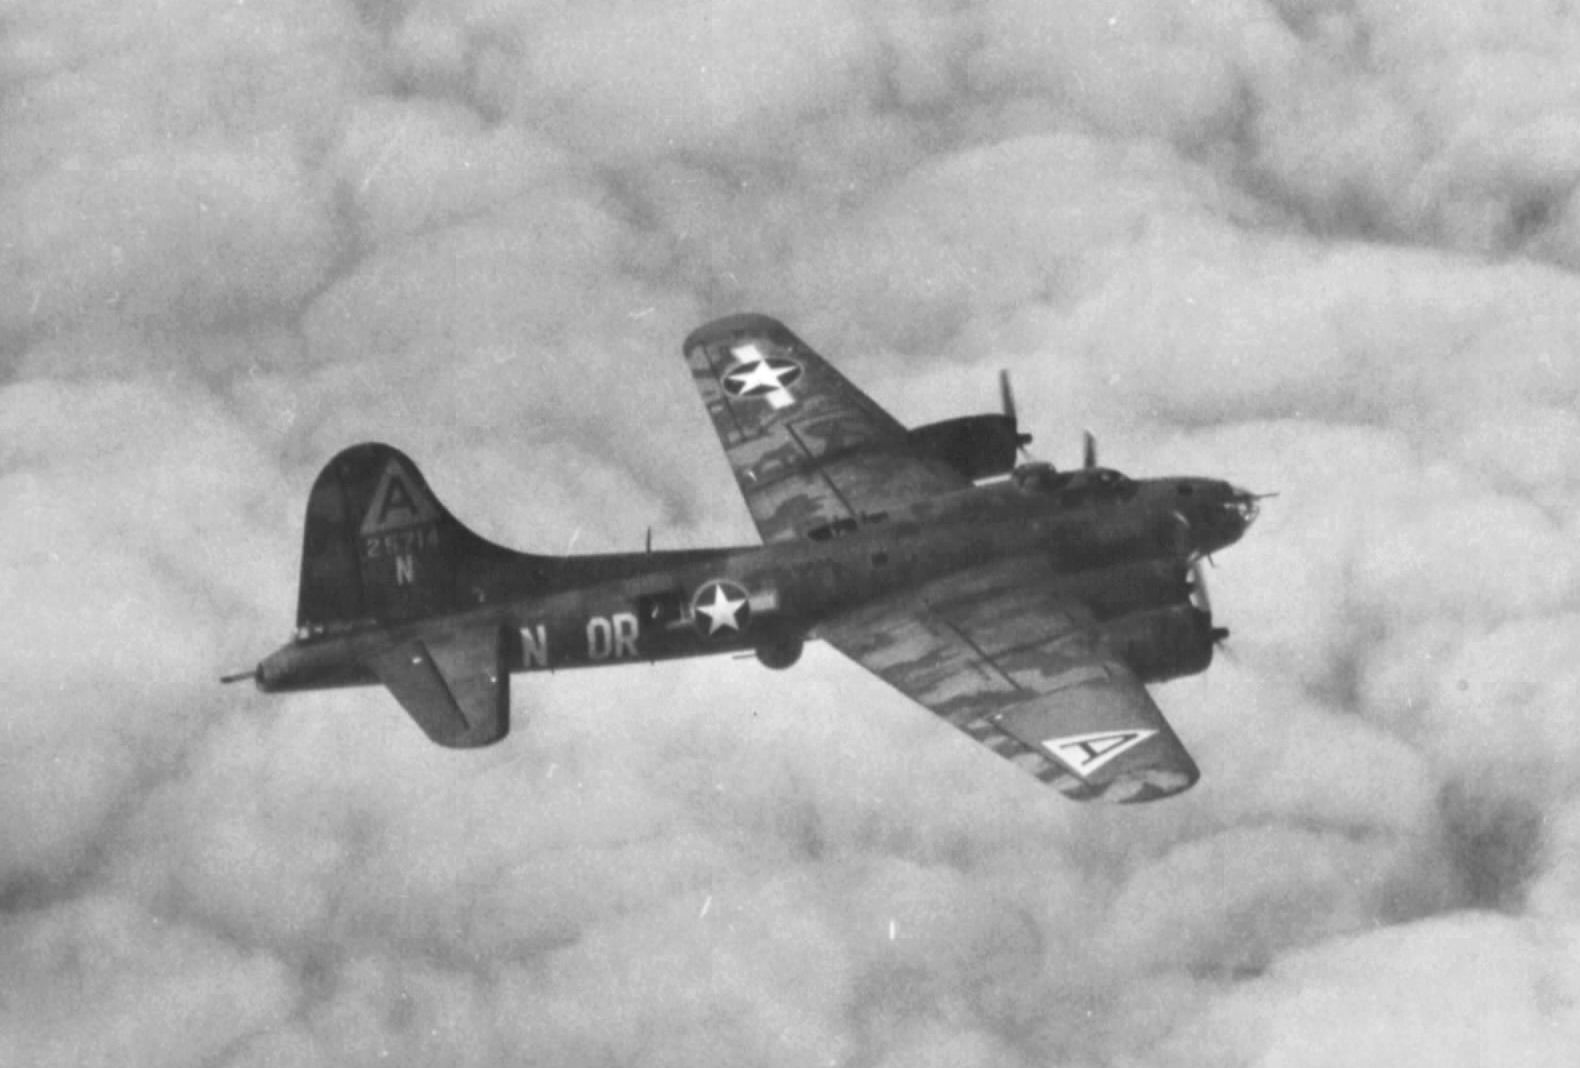 B-17 #42-5714 / Old Faithful II